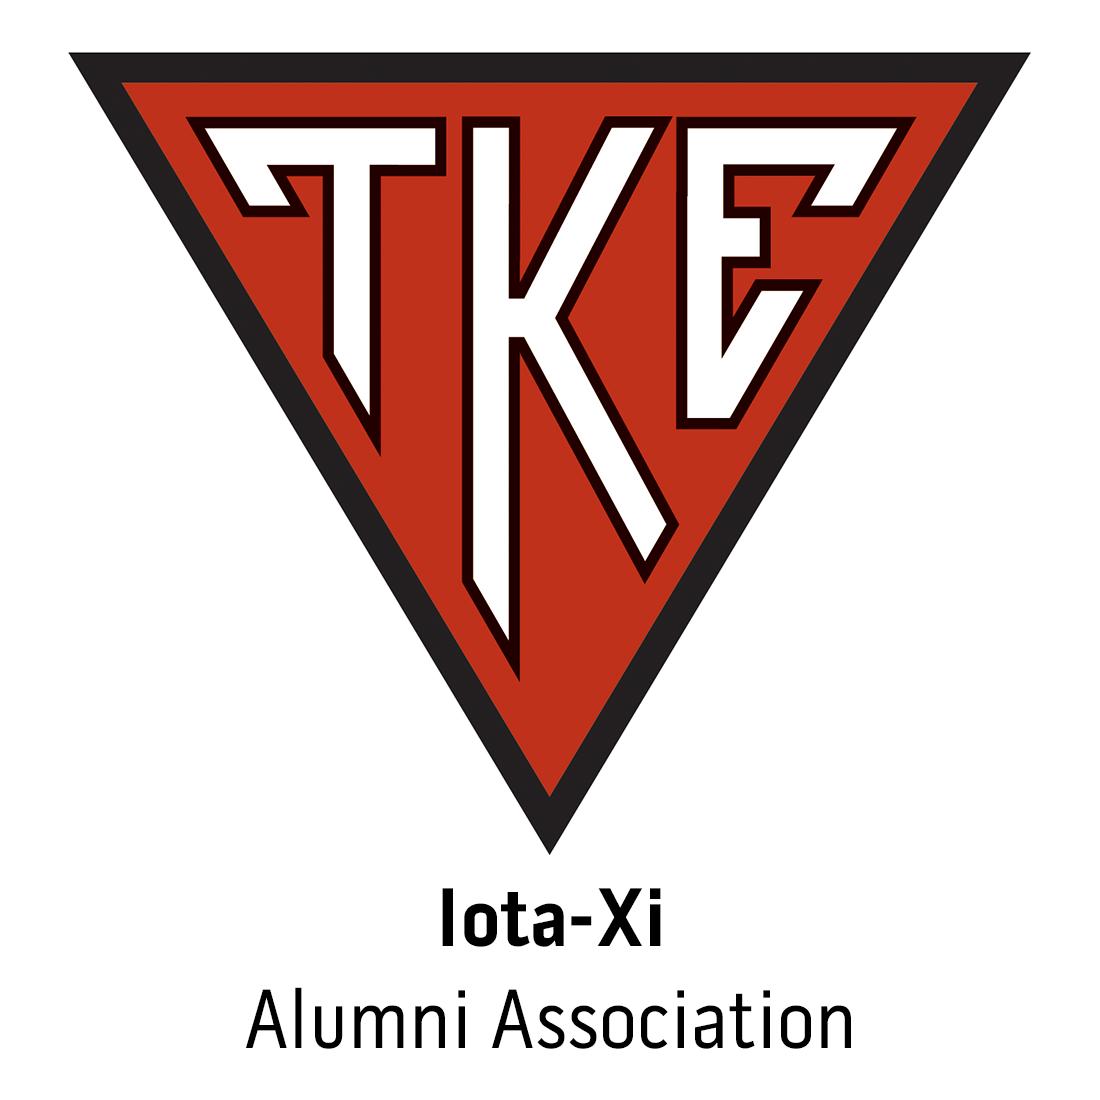 Iota-Xi Alumni Association for Concord University